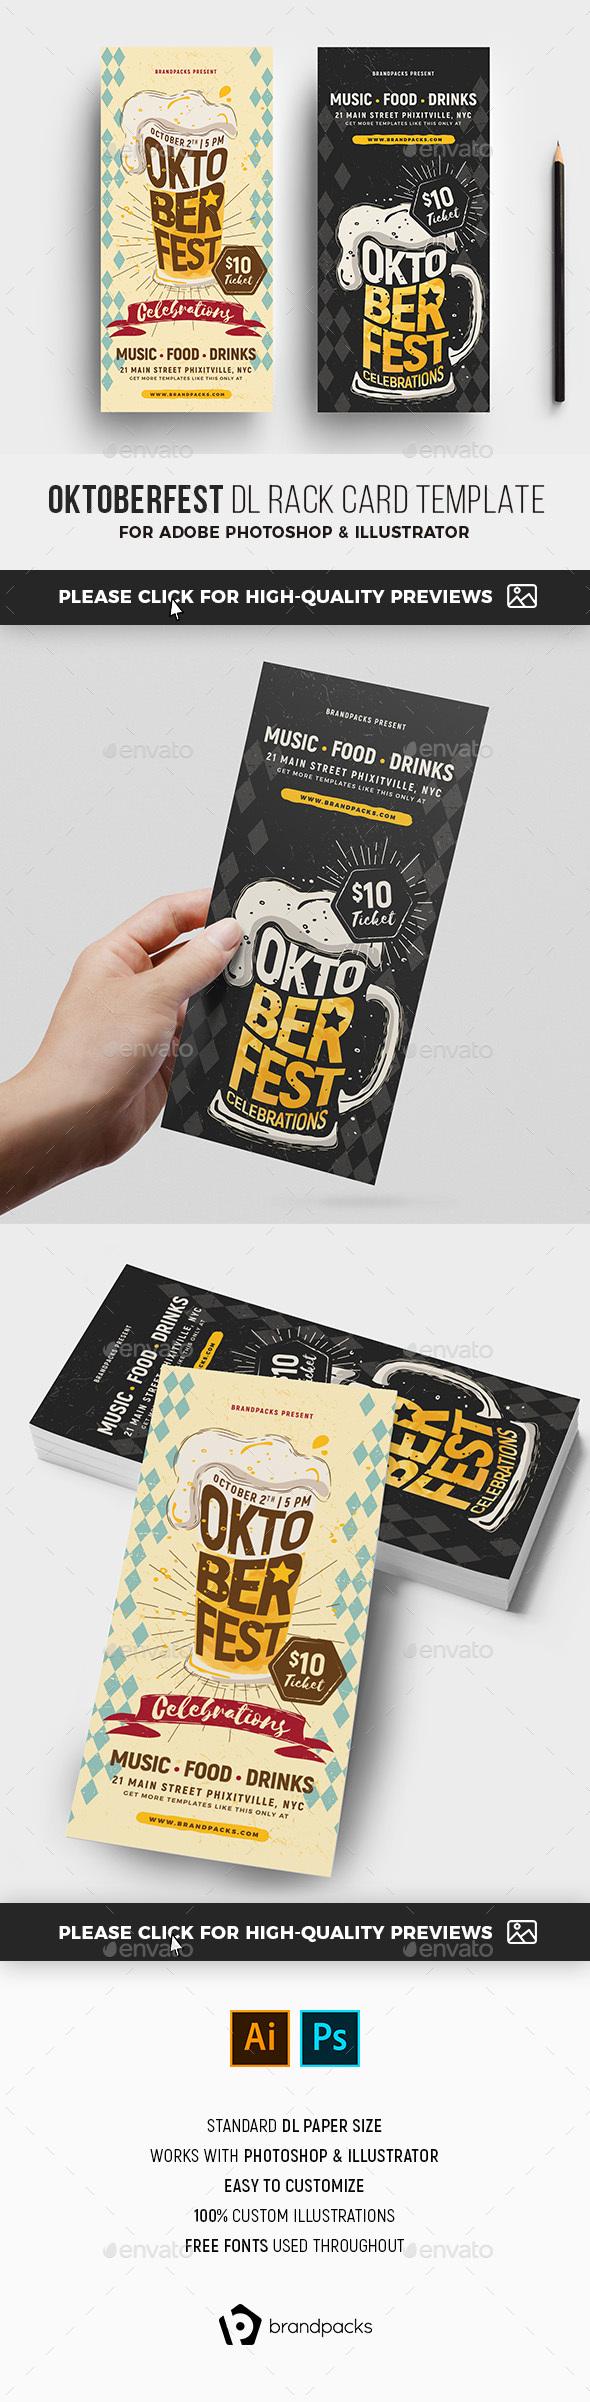 Oktoberfest Dl Flyer Template By Brandpacks Graphicriver